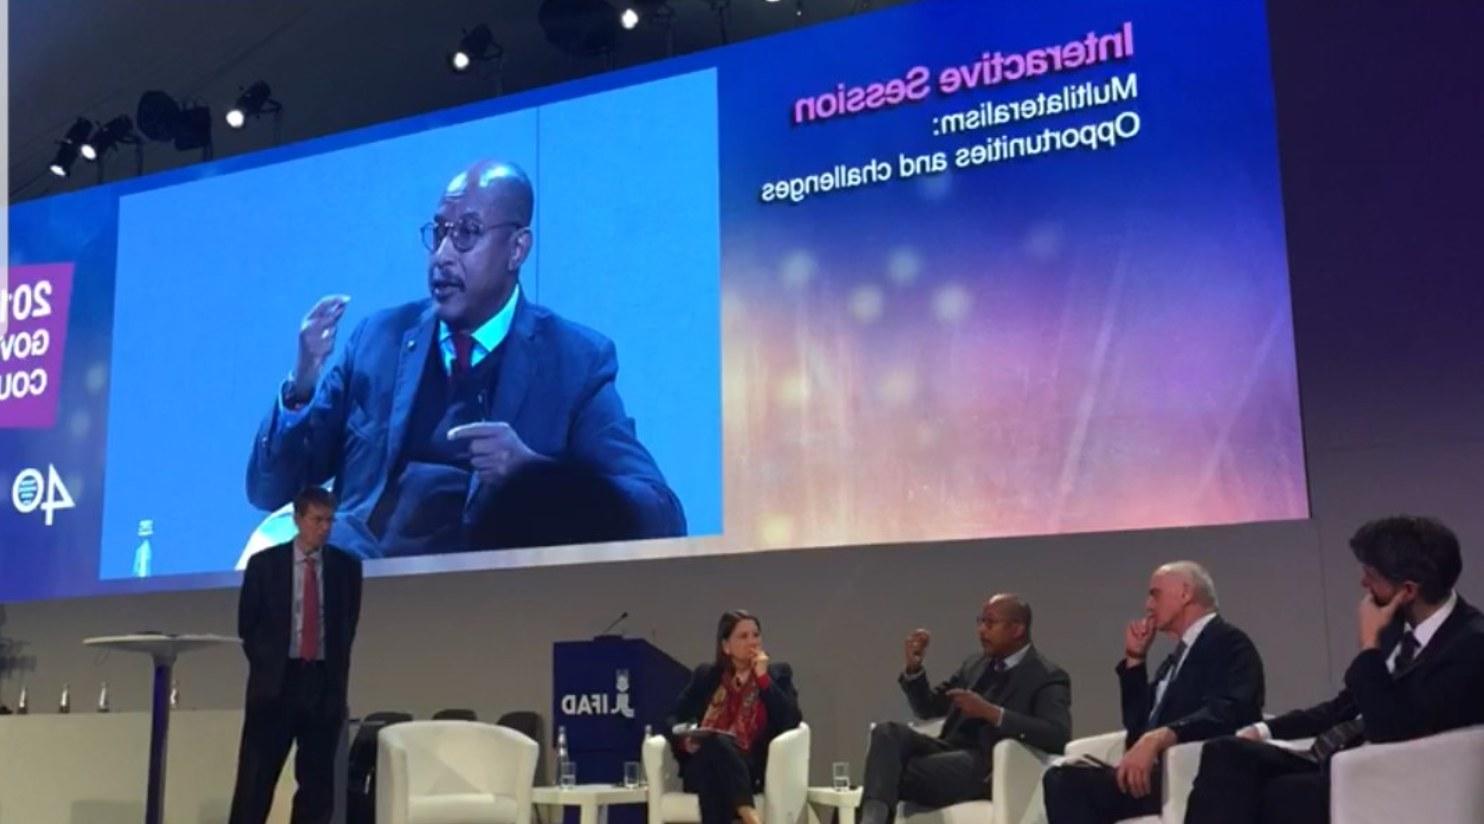 Bentuk Gaun Pesta Pengantin Muslim 4pde Multilateralism Opportunities and Challenges for Africa